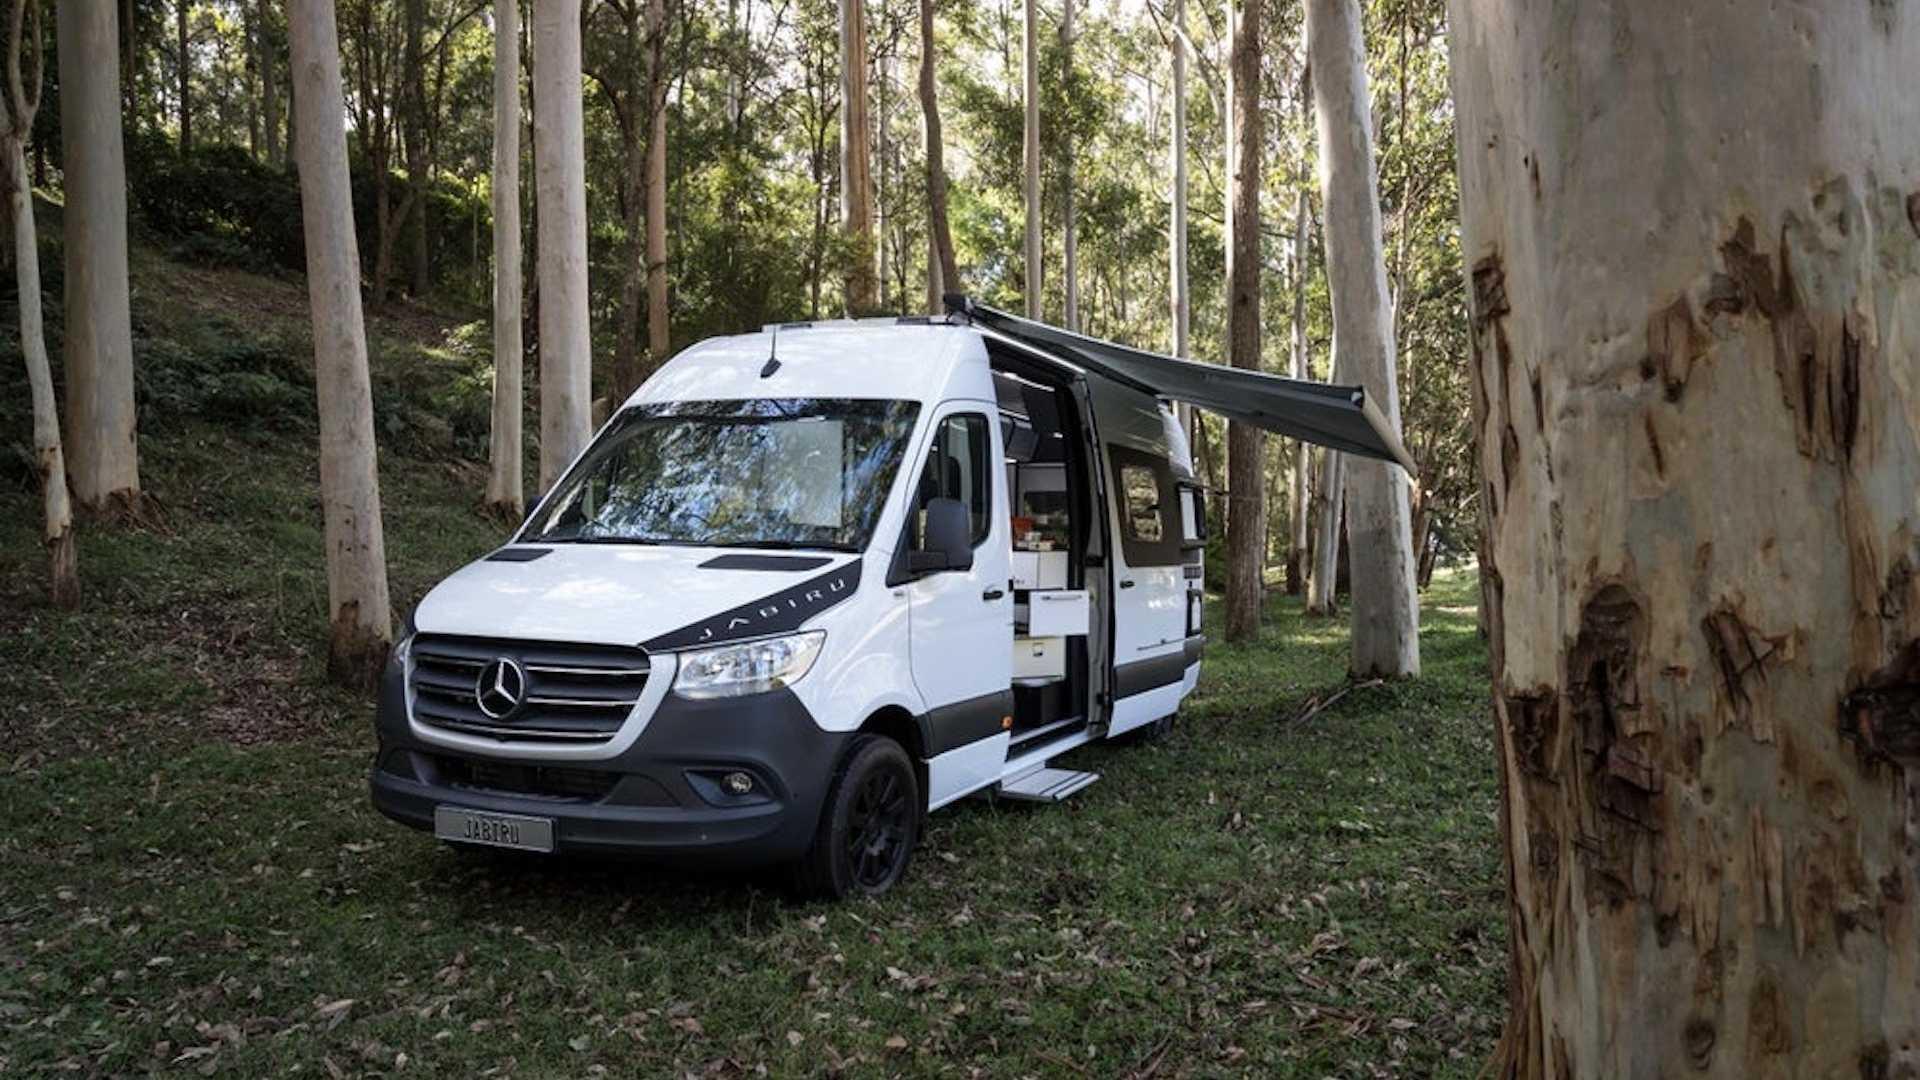 Trakka Jabiru Sprinter Camper Van Features A Swivel-Out Fridge